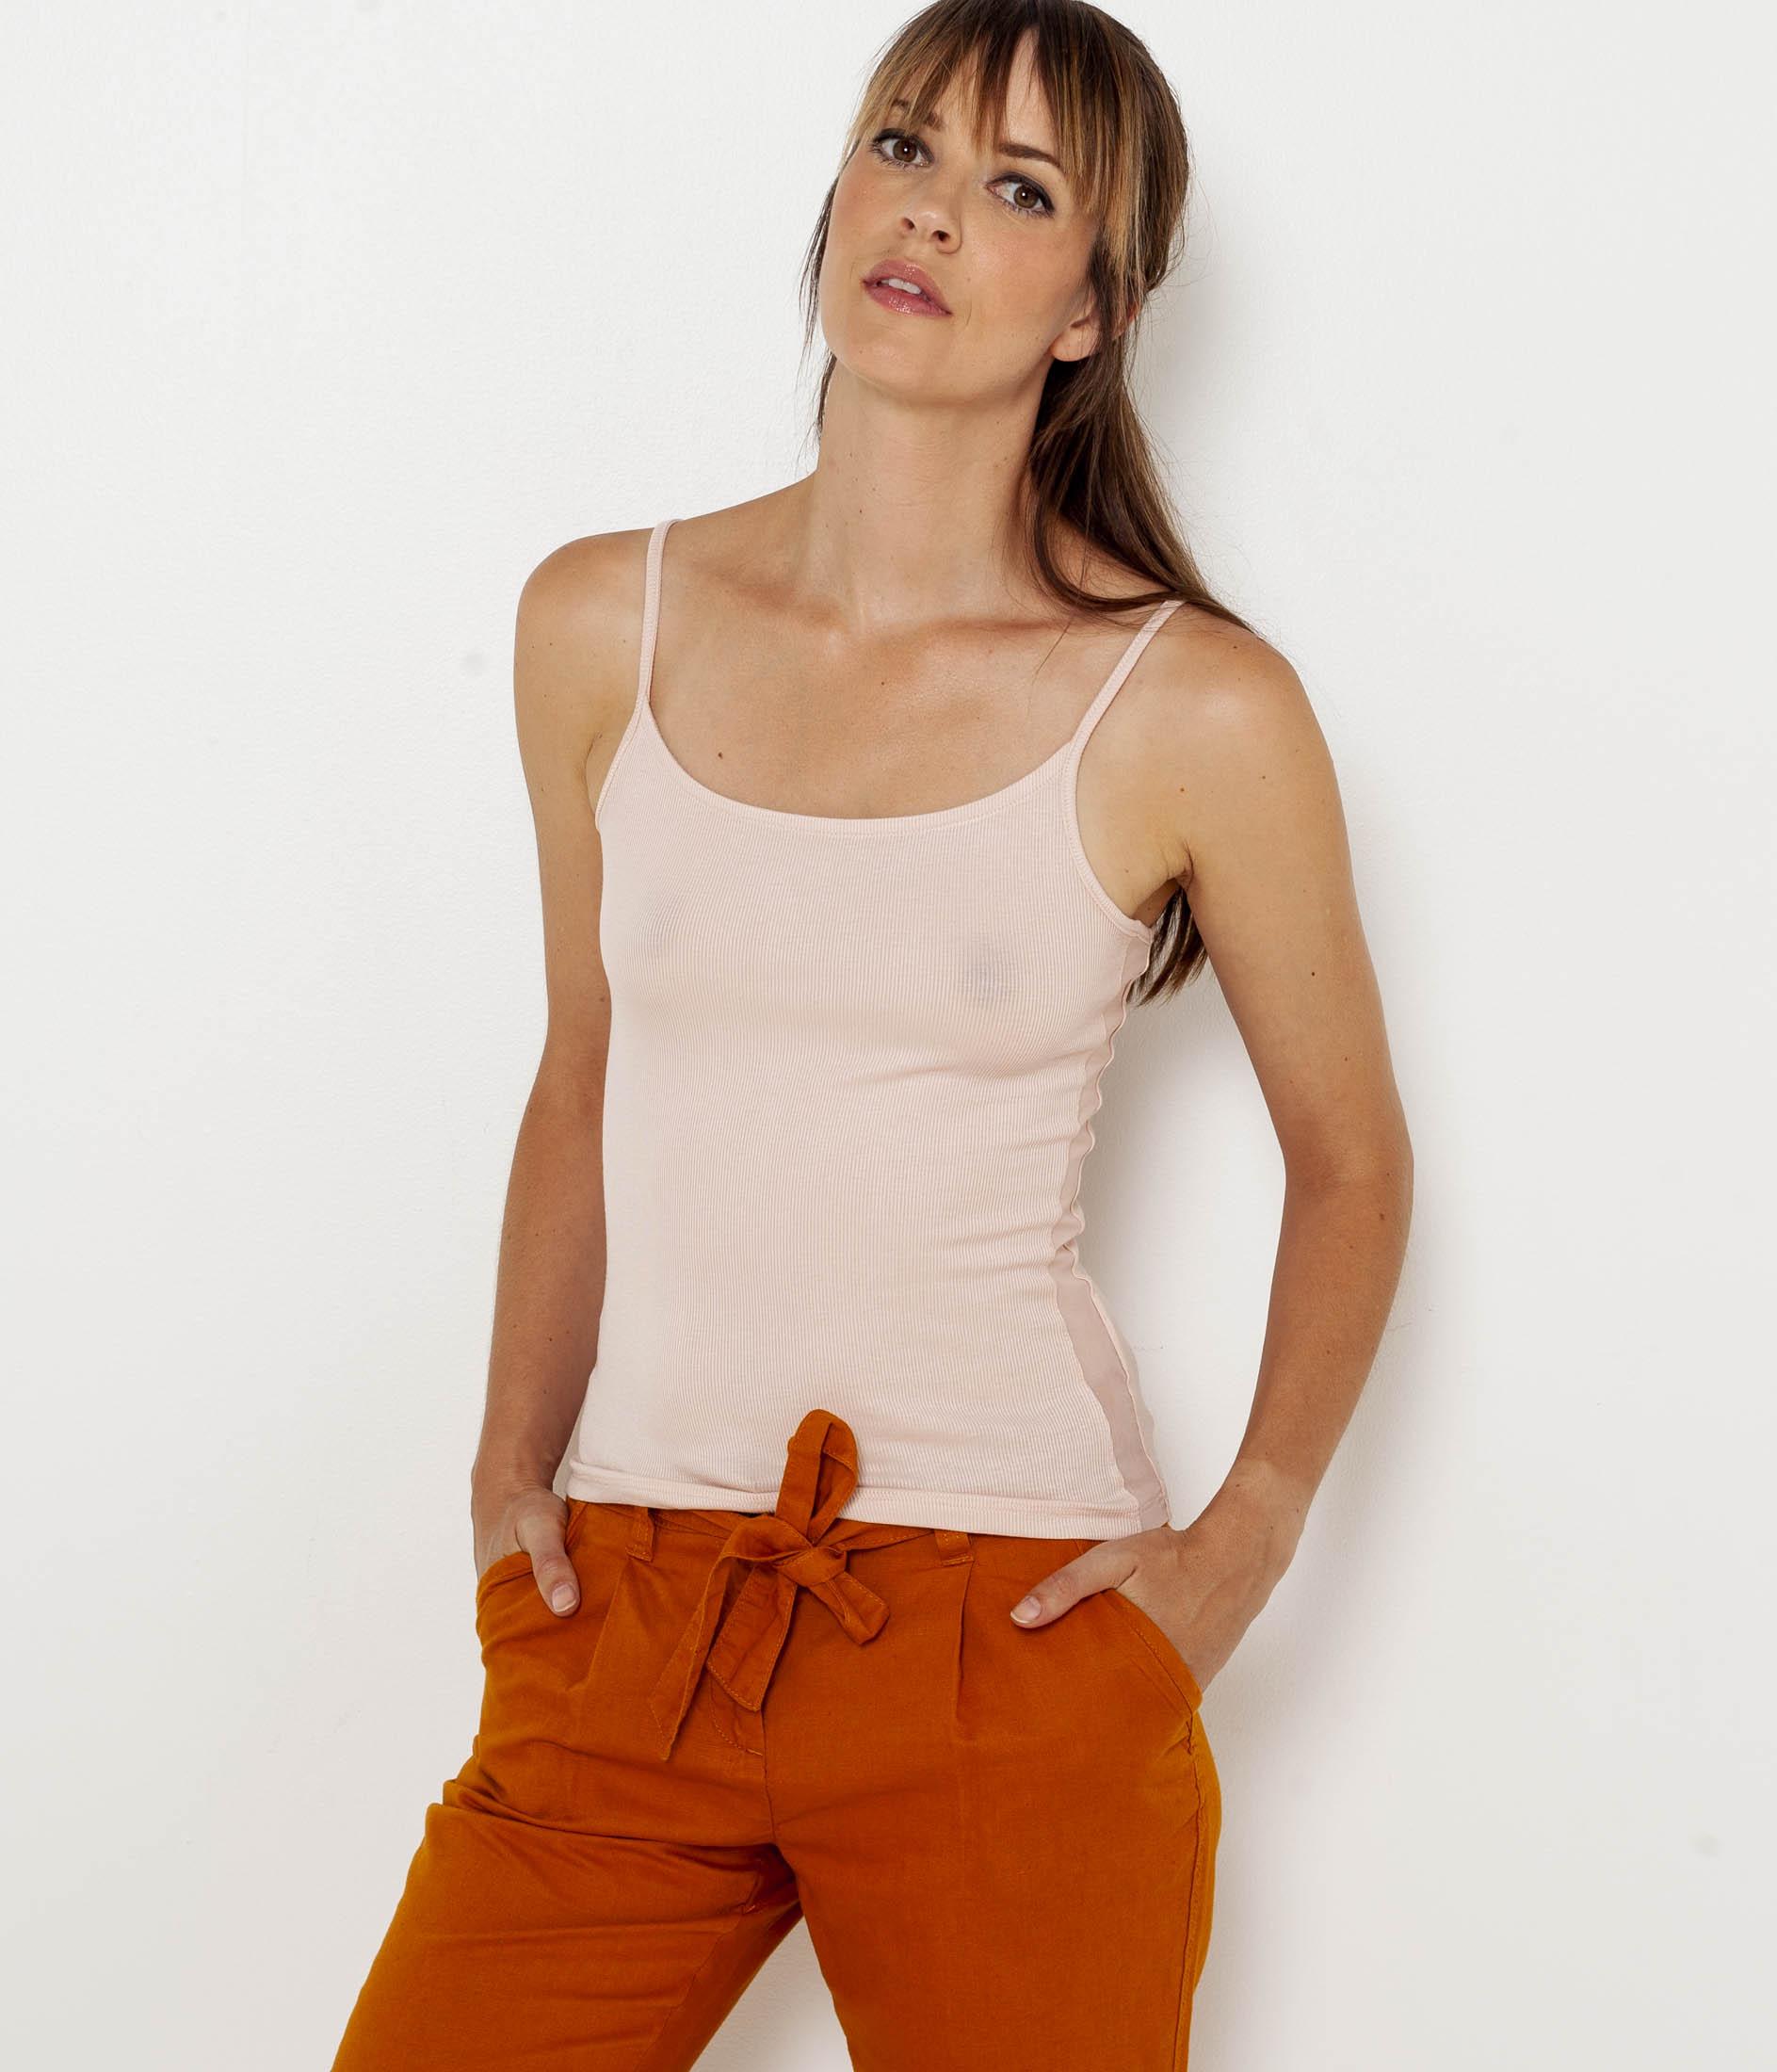 Bretelles Camaï Côtelé Top Fines Femme Camaïeu T1FJclK